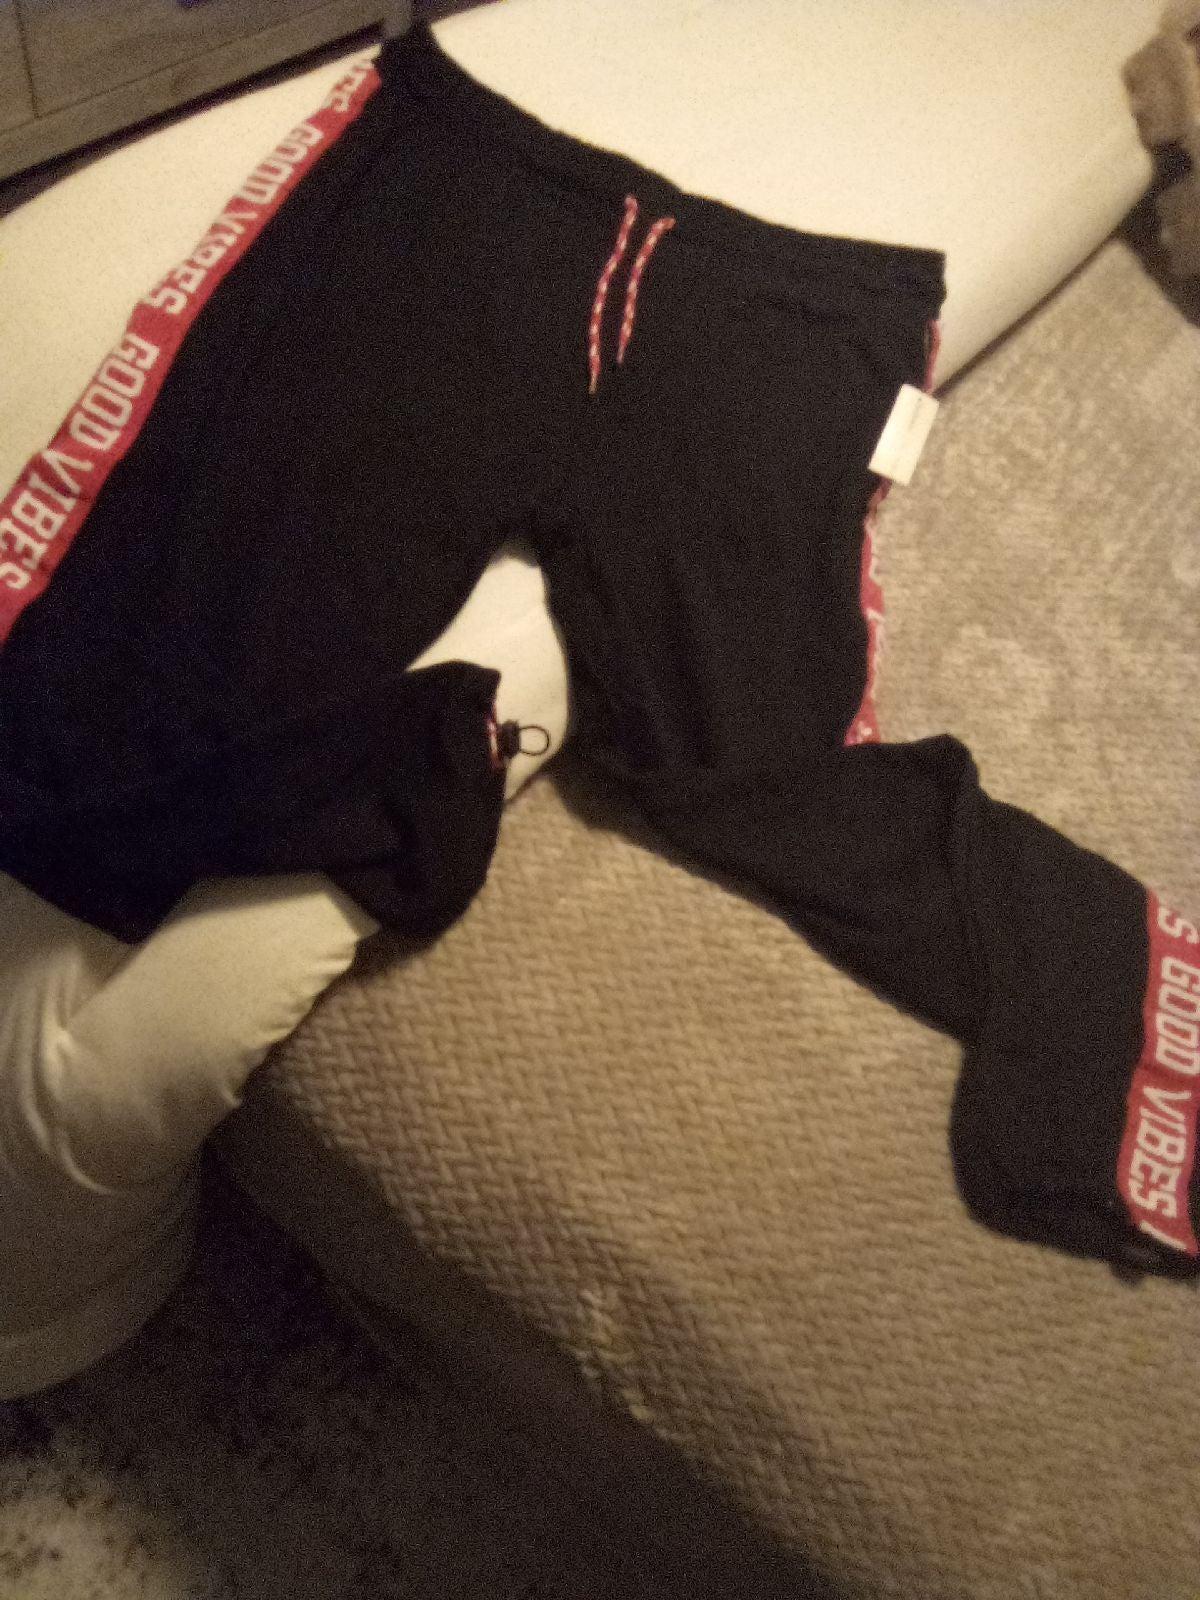 womens joggers Bobbie Brooks xl pink/blk